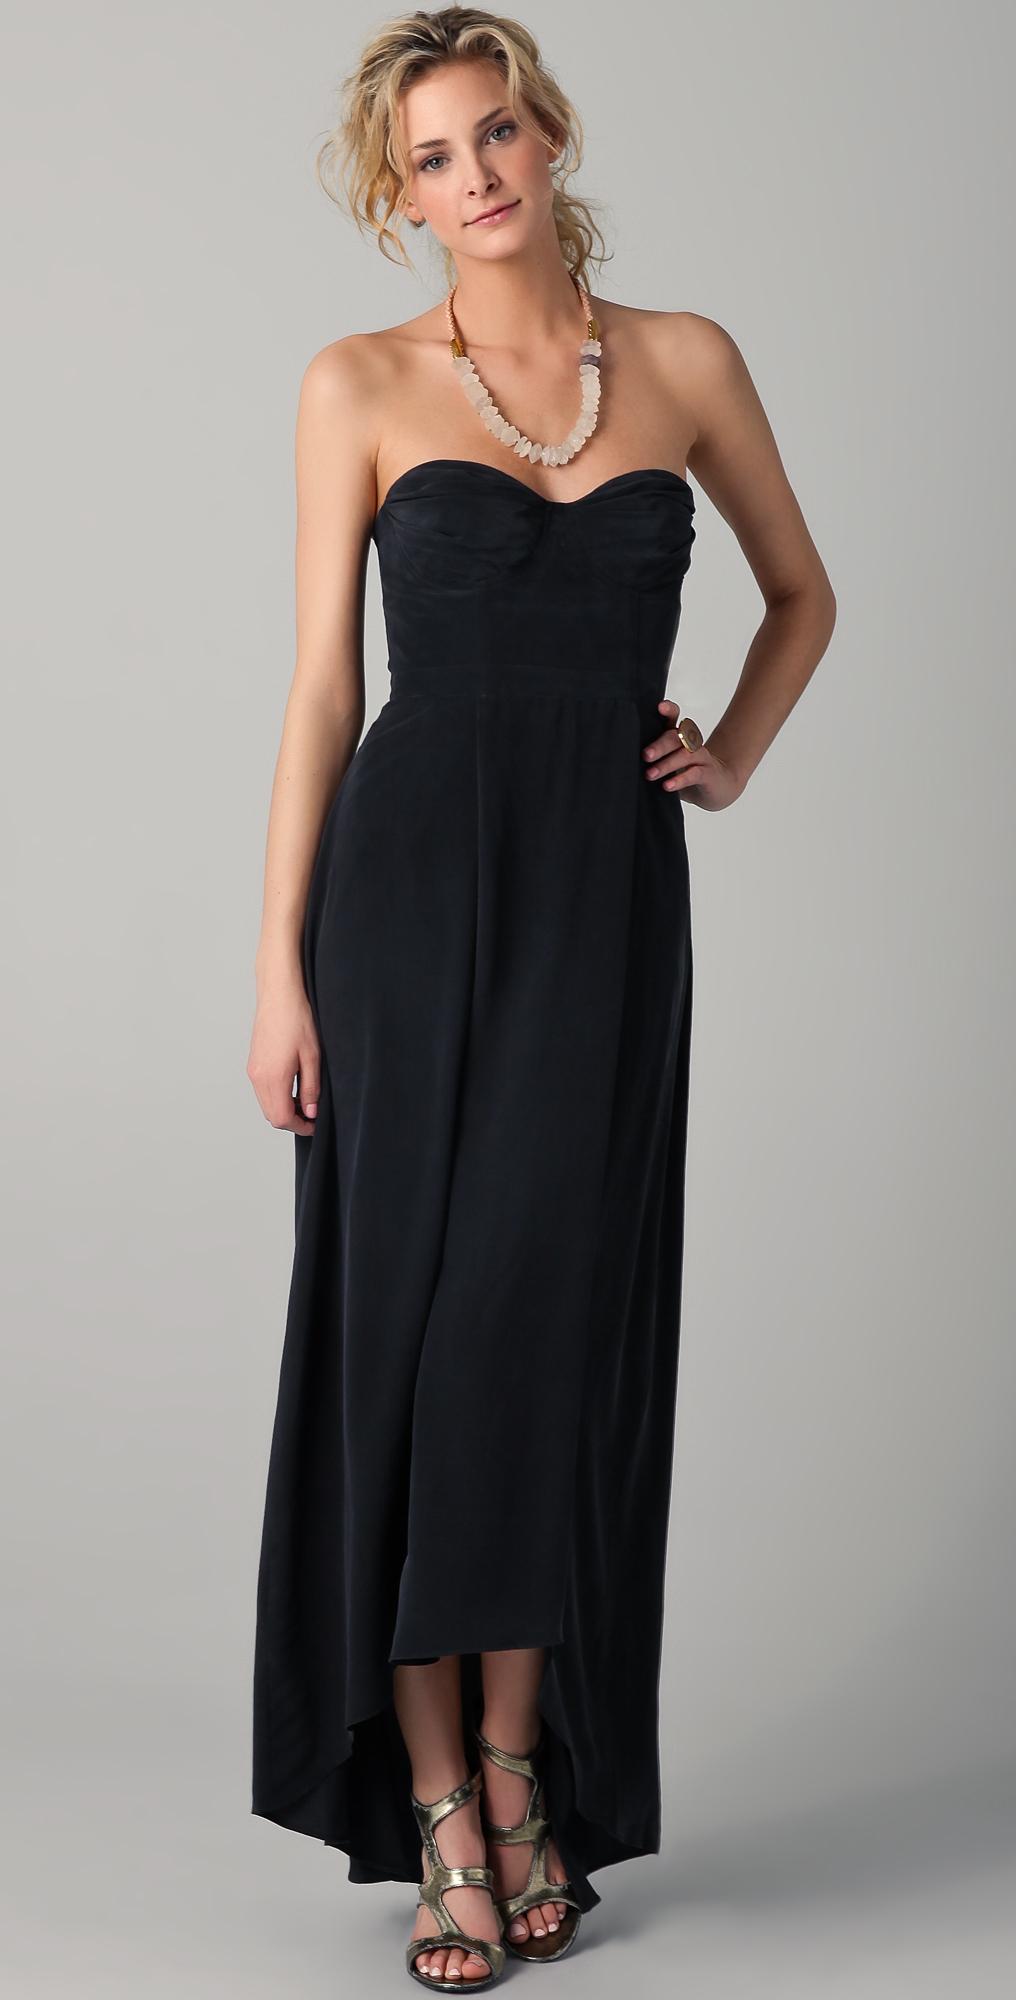 Zimmermann Strapless Underwire Long Dress In Black Lyst